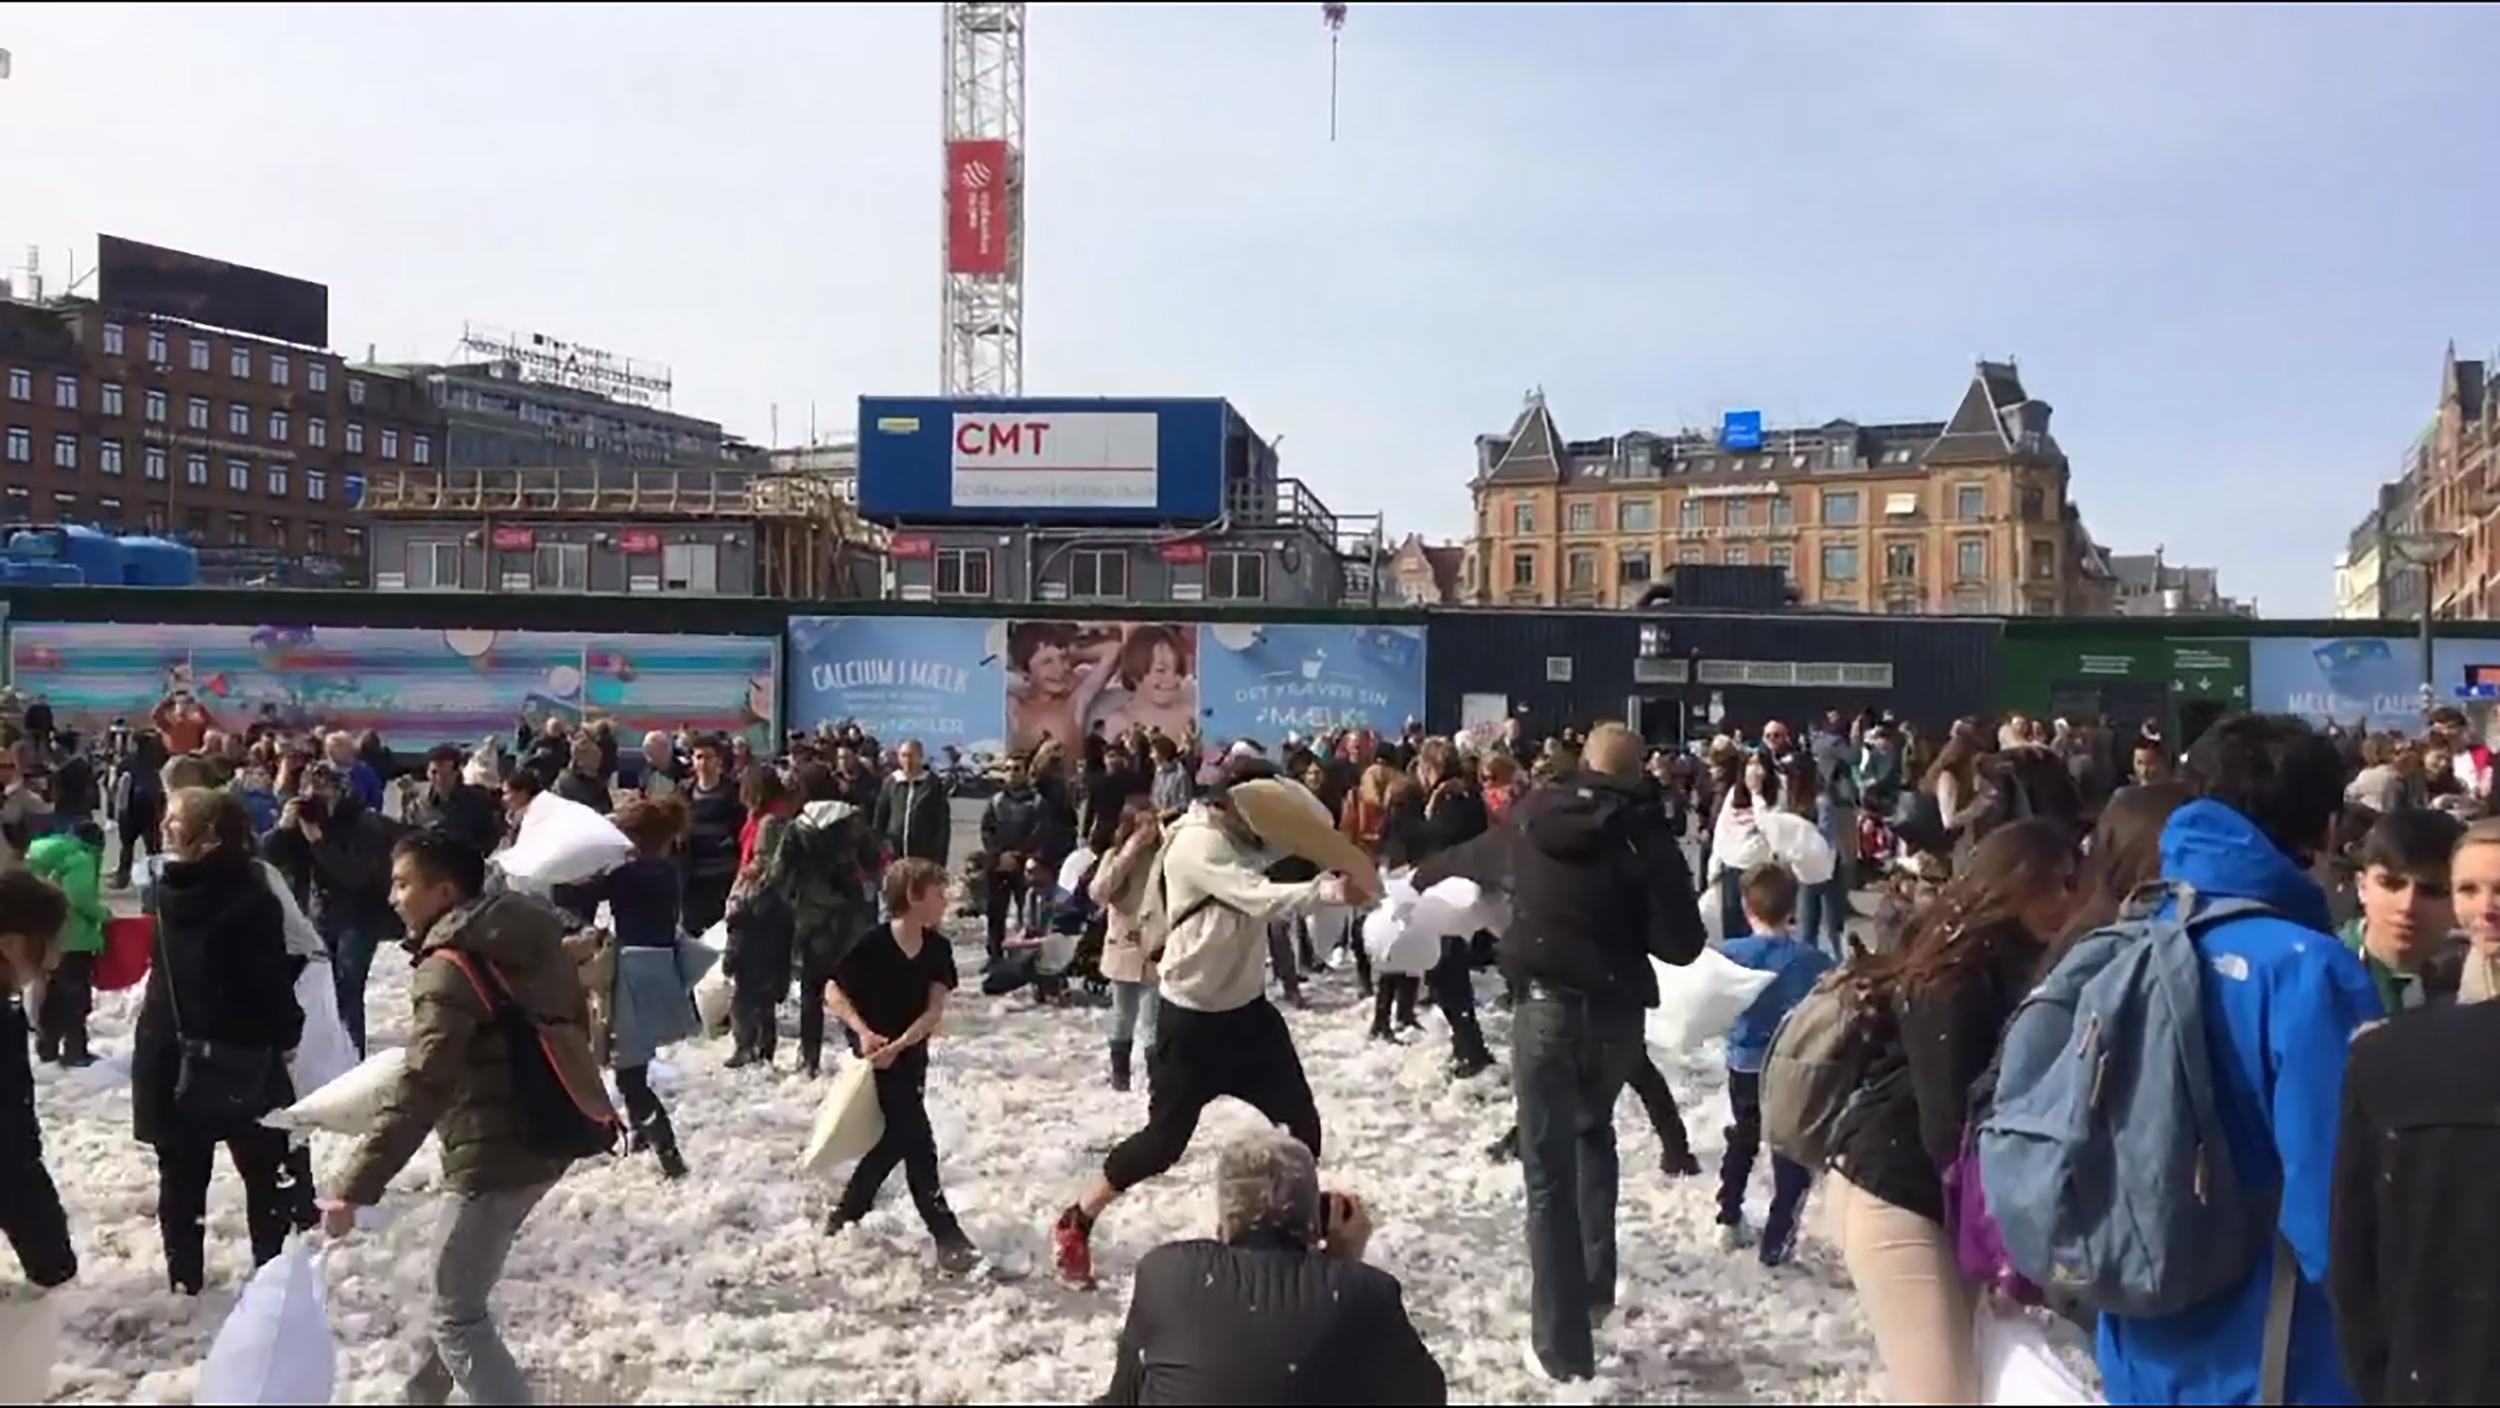 Mid-pillow fight in Copenhagen.